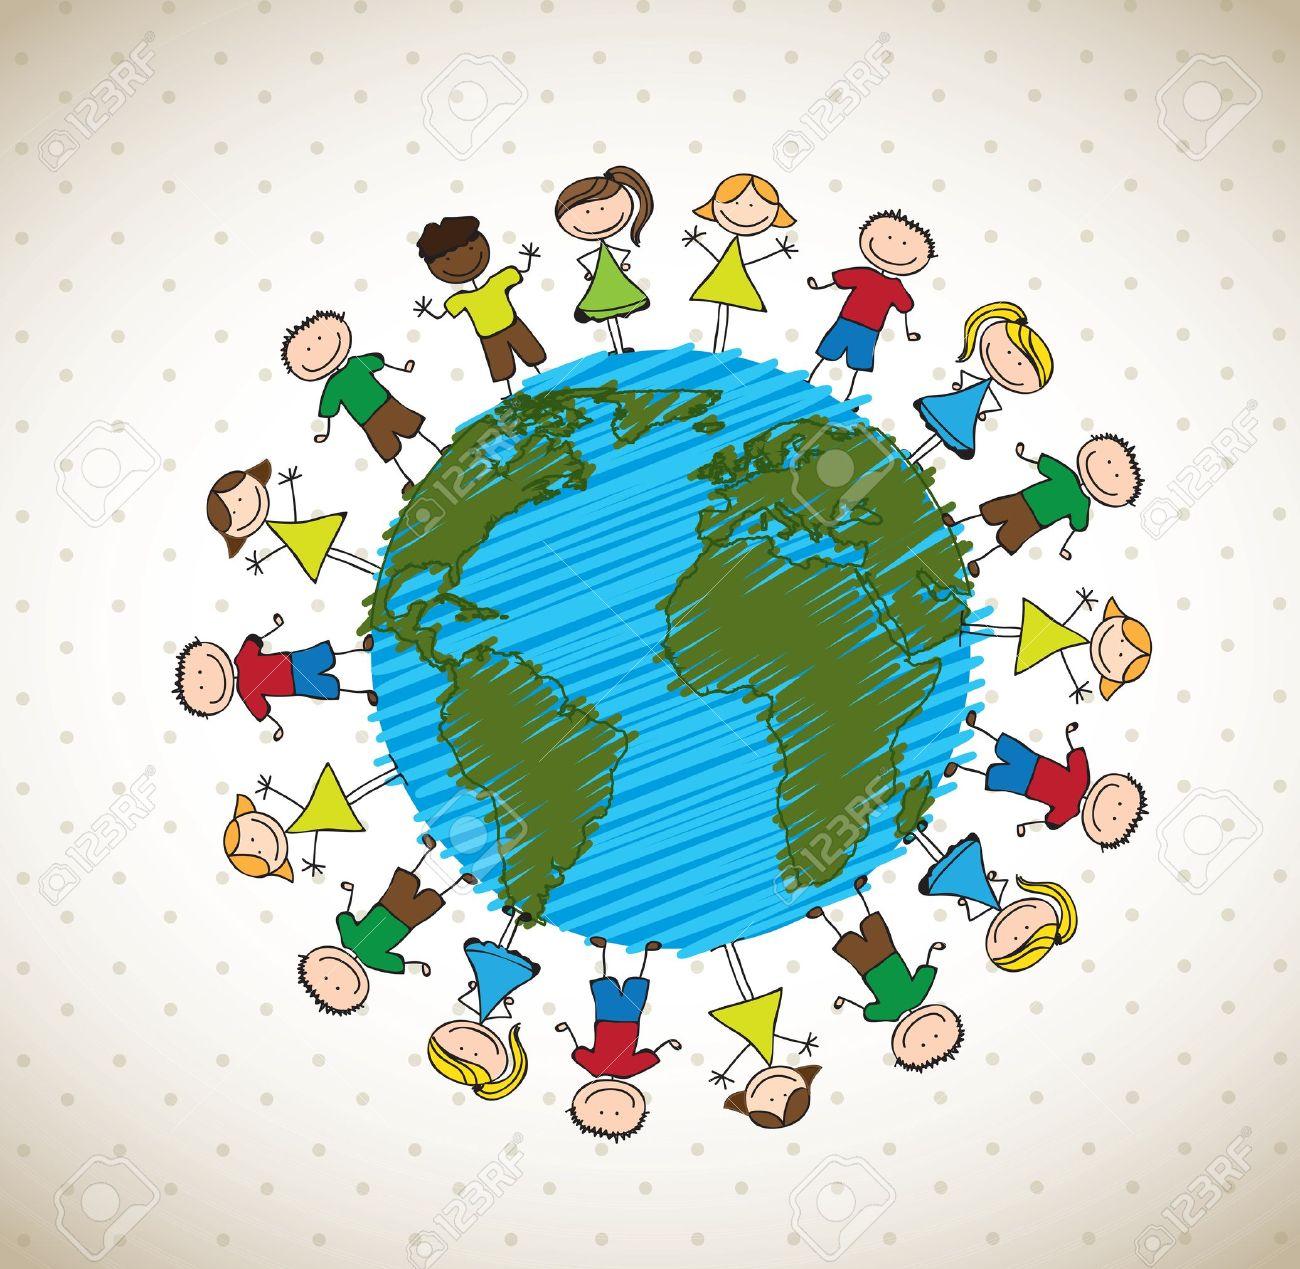 many happy children around the world vector illustration Stock Vector - 15888571